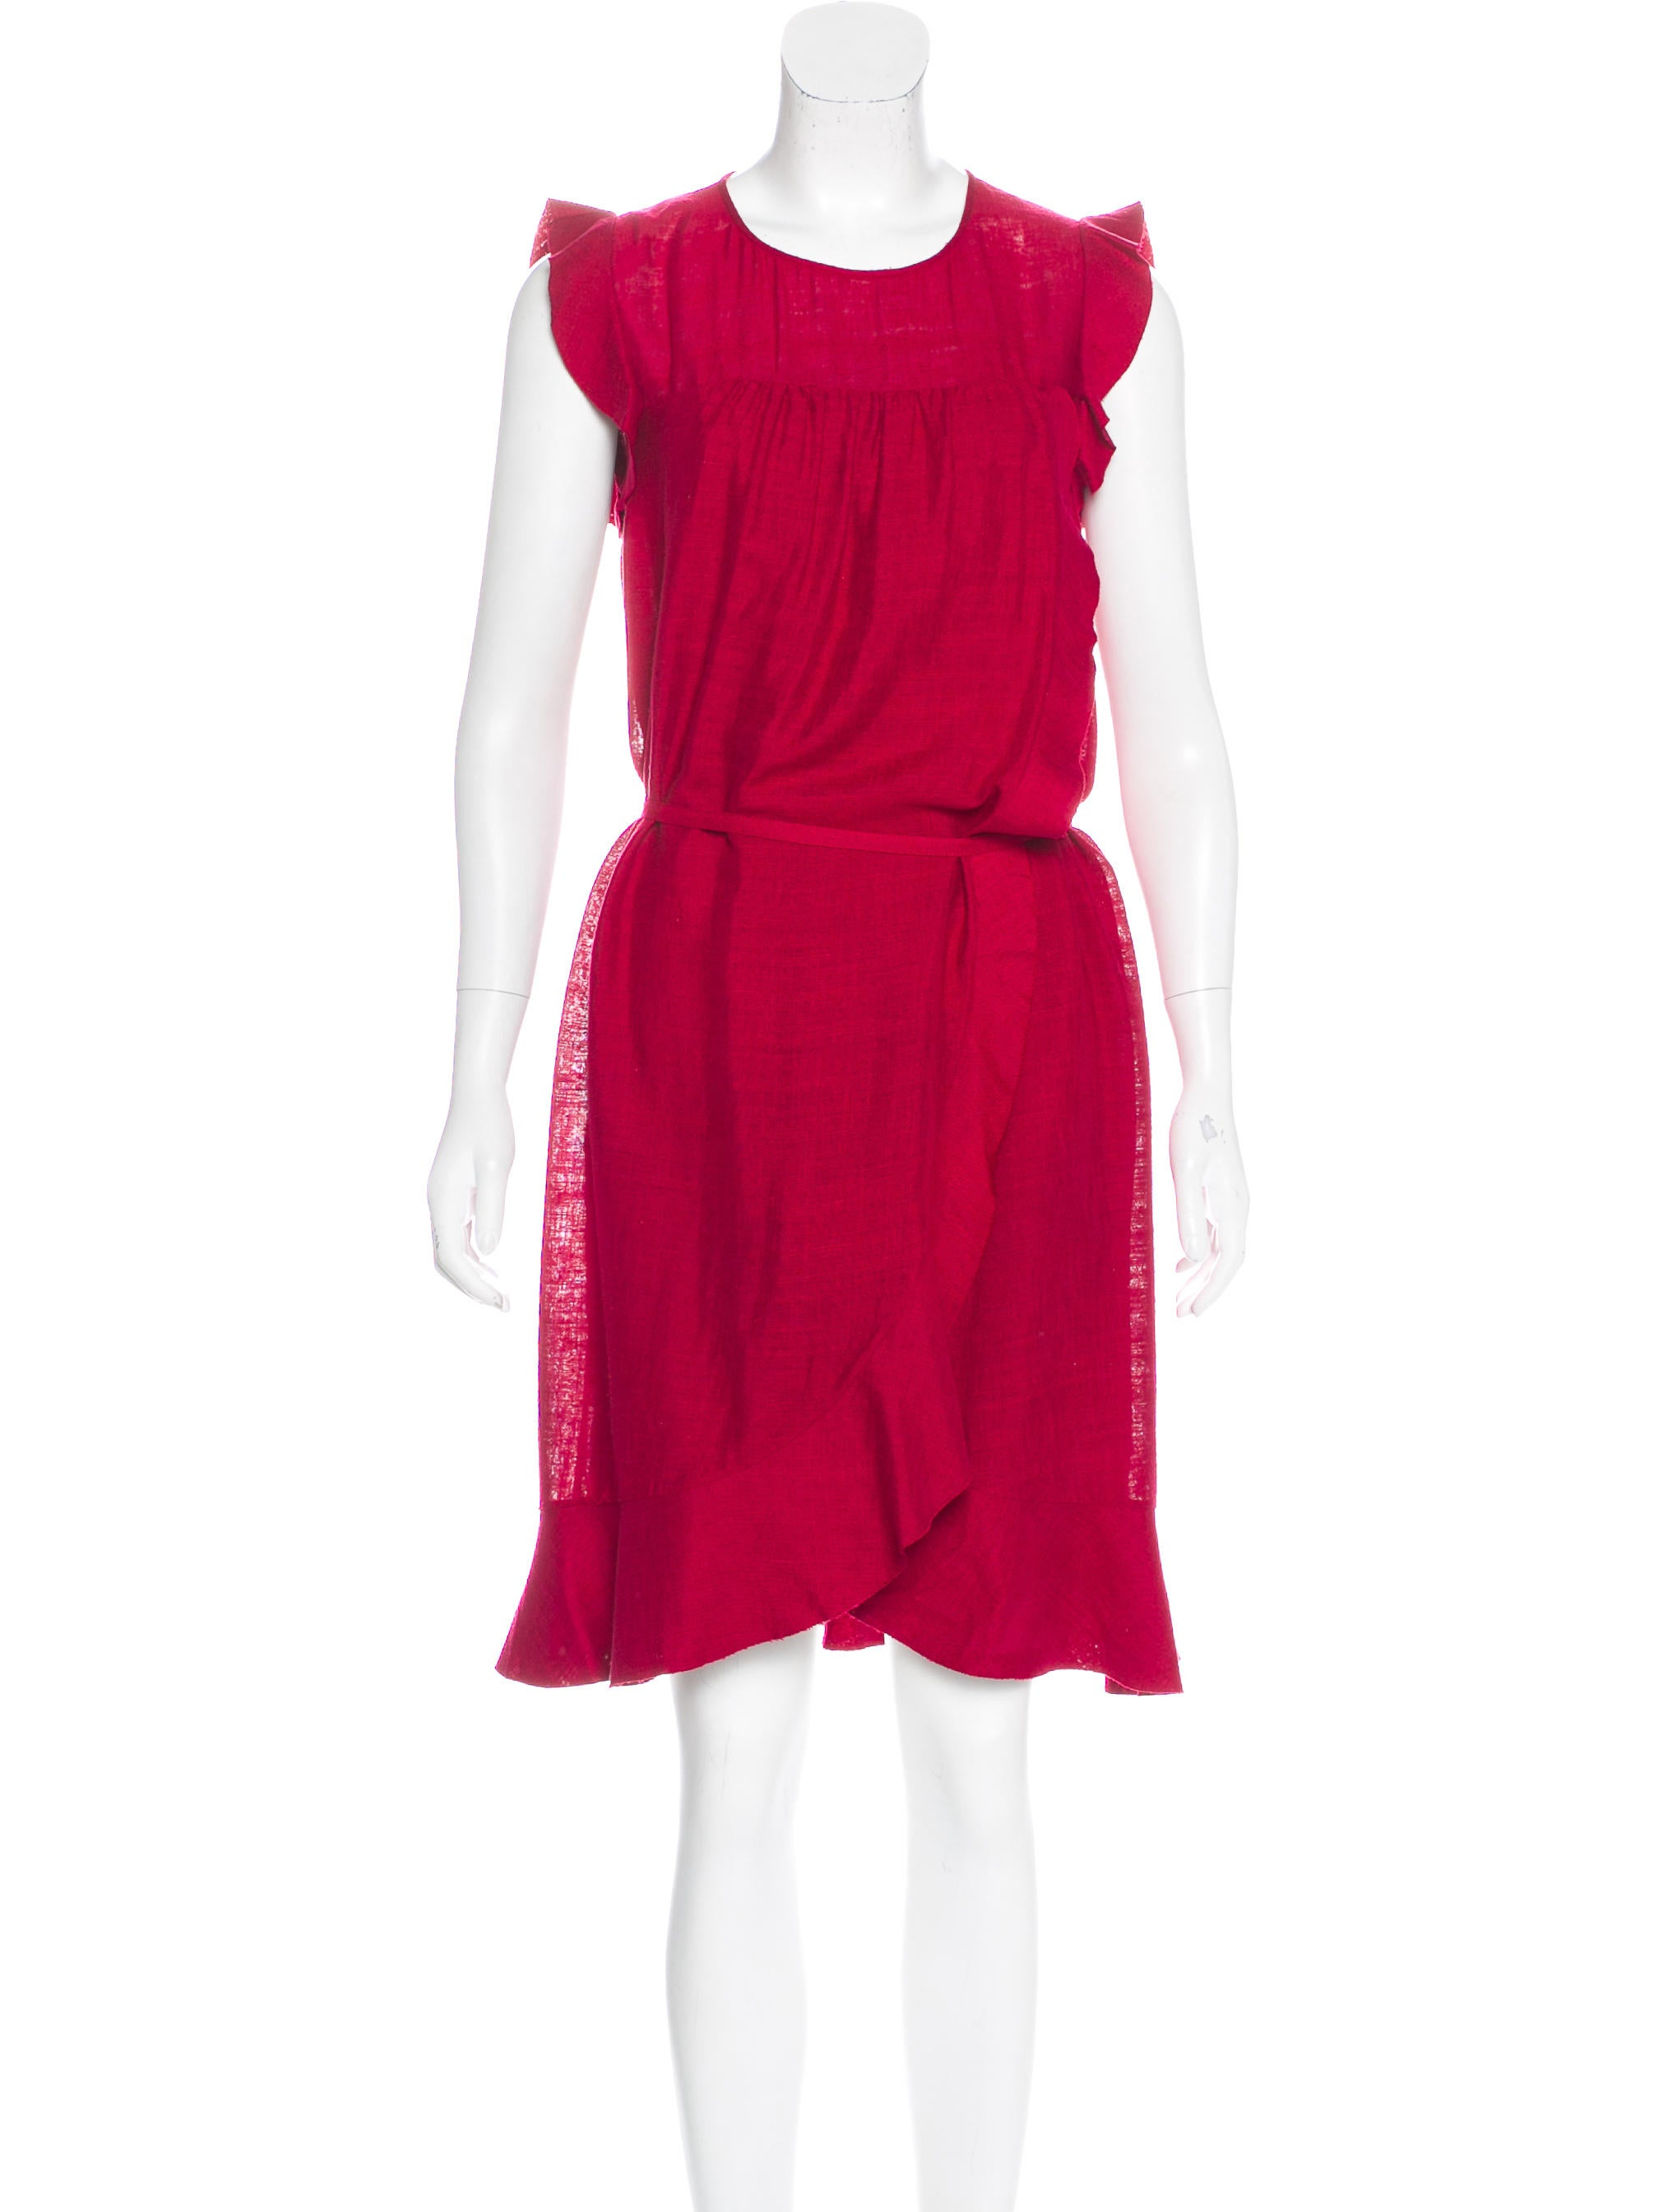 Toile isabel marant silk ruffled dress clothing for Isabel marant shirt dress